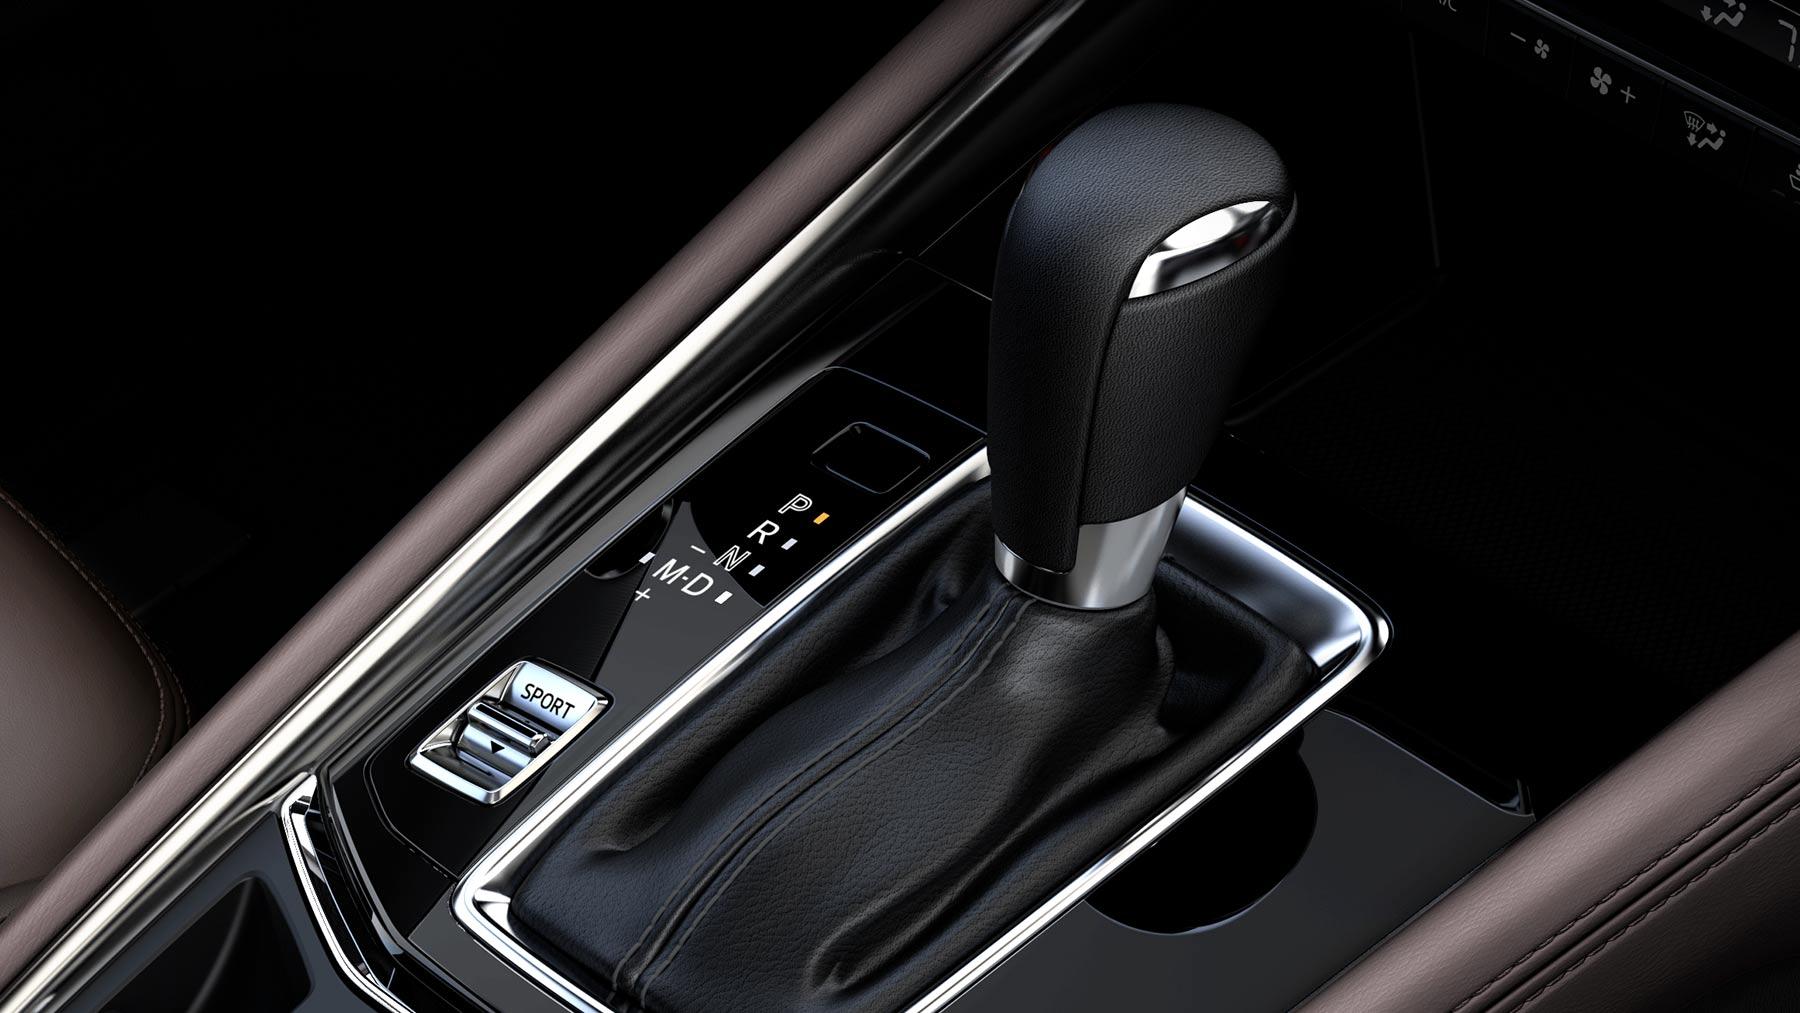 Stunning Amenities in the 2019 Mazda CX-5